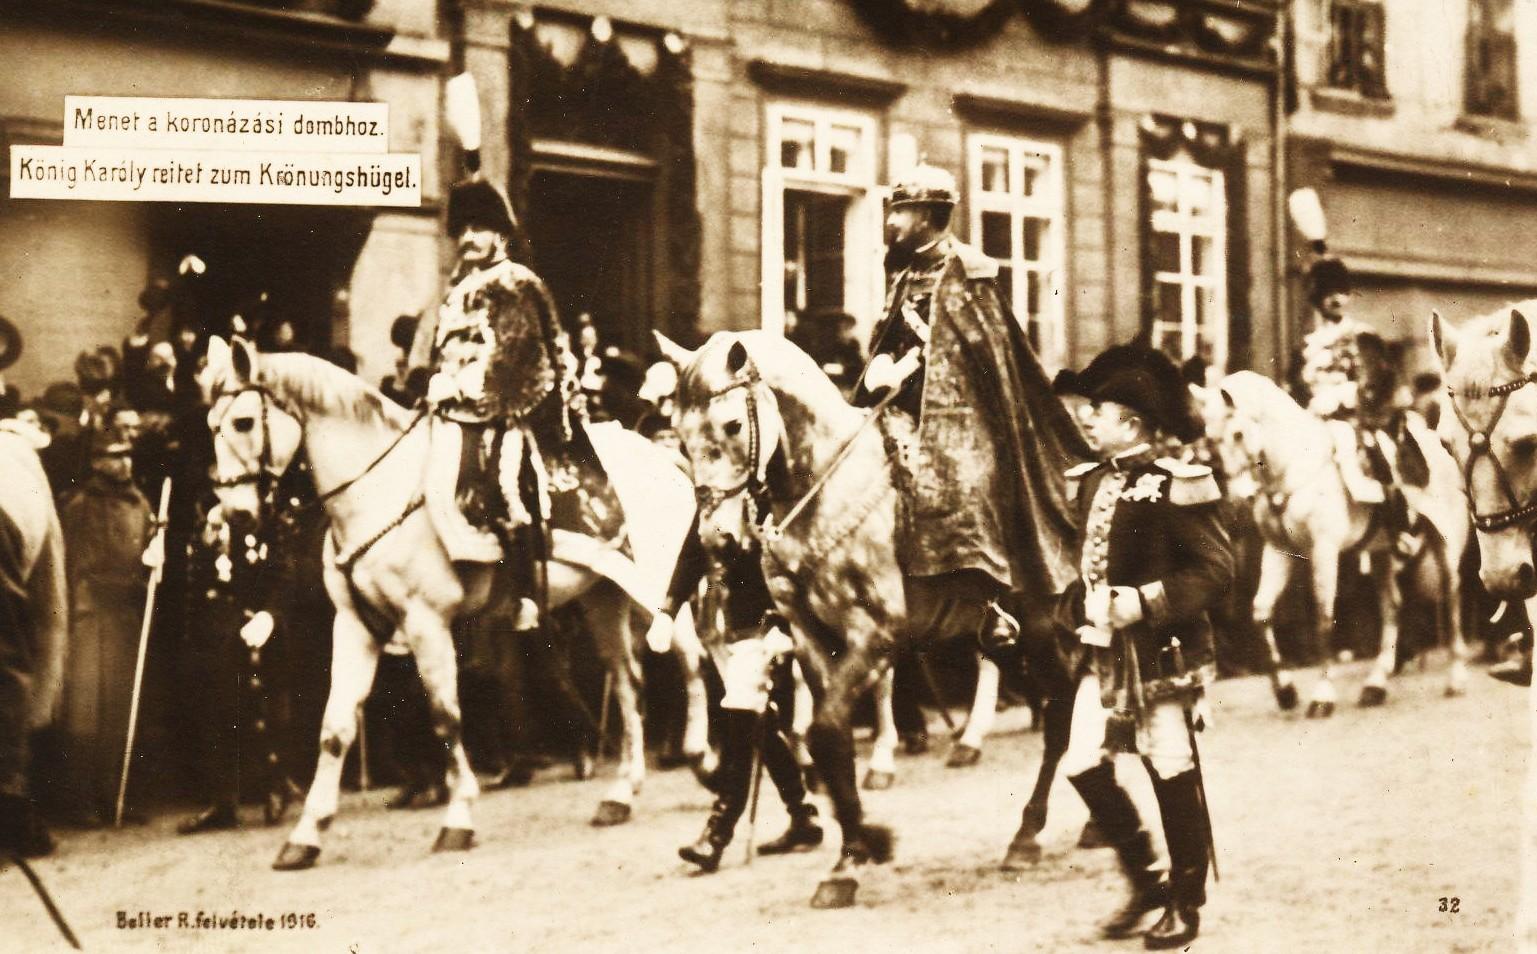 karl-1916-ung-2-xc1